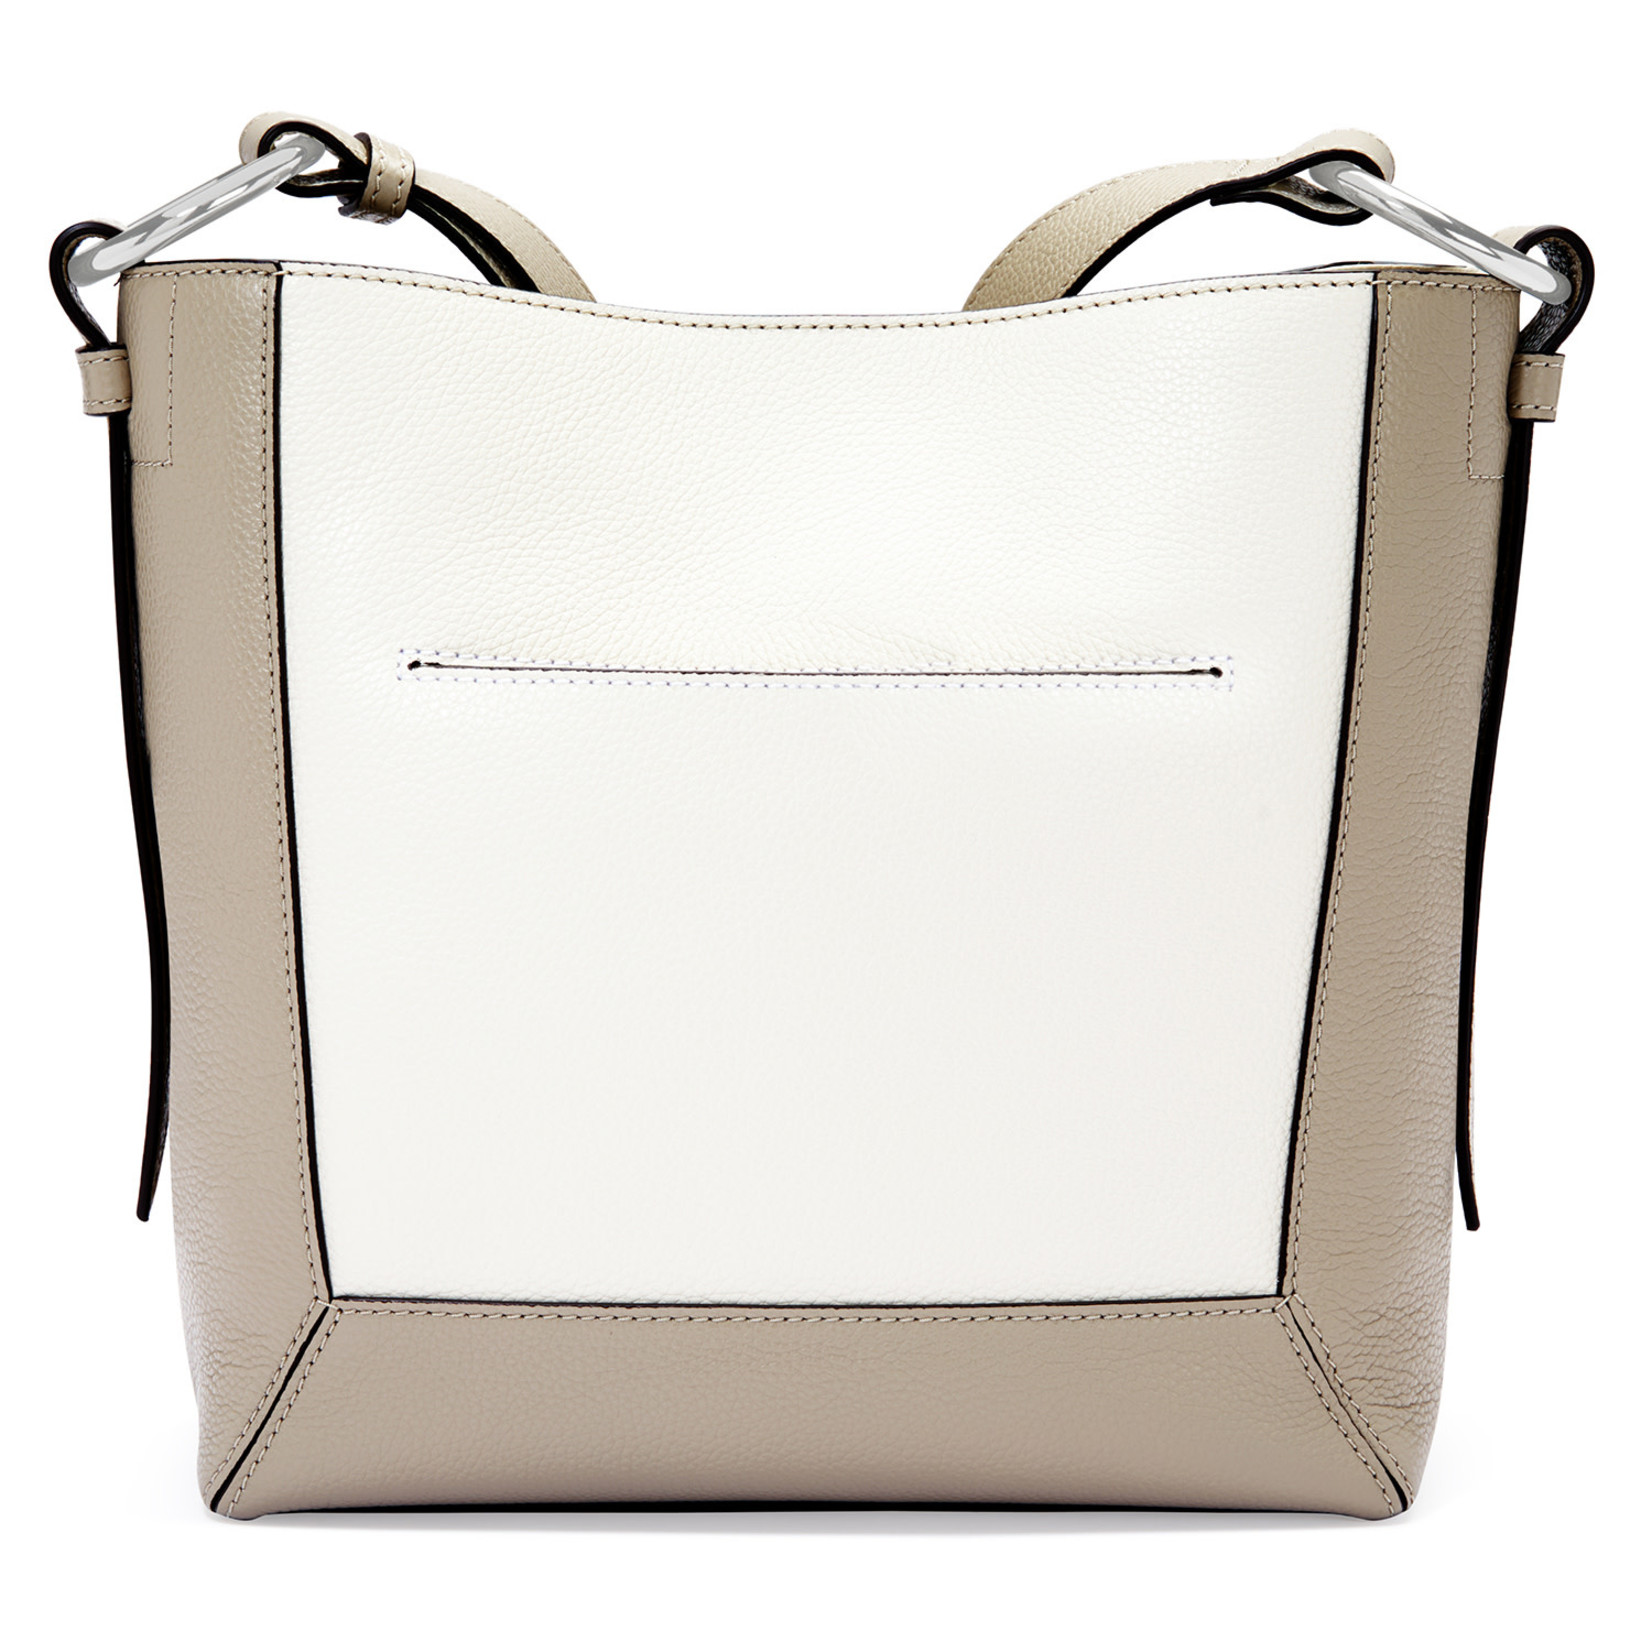 Brighton Kylie Cross Body Bag - Beechwood-White